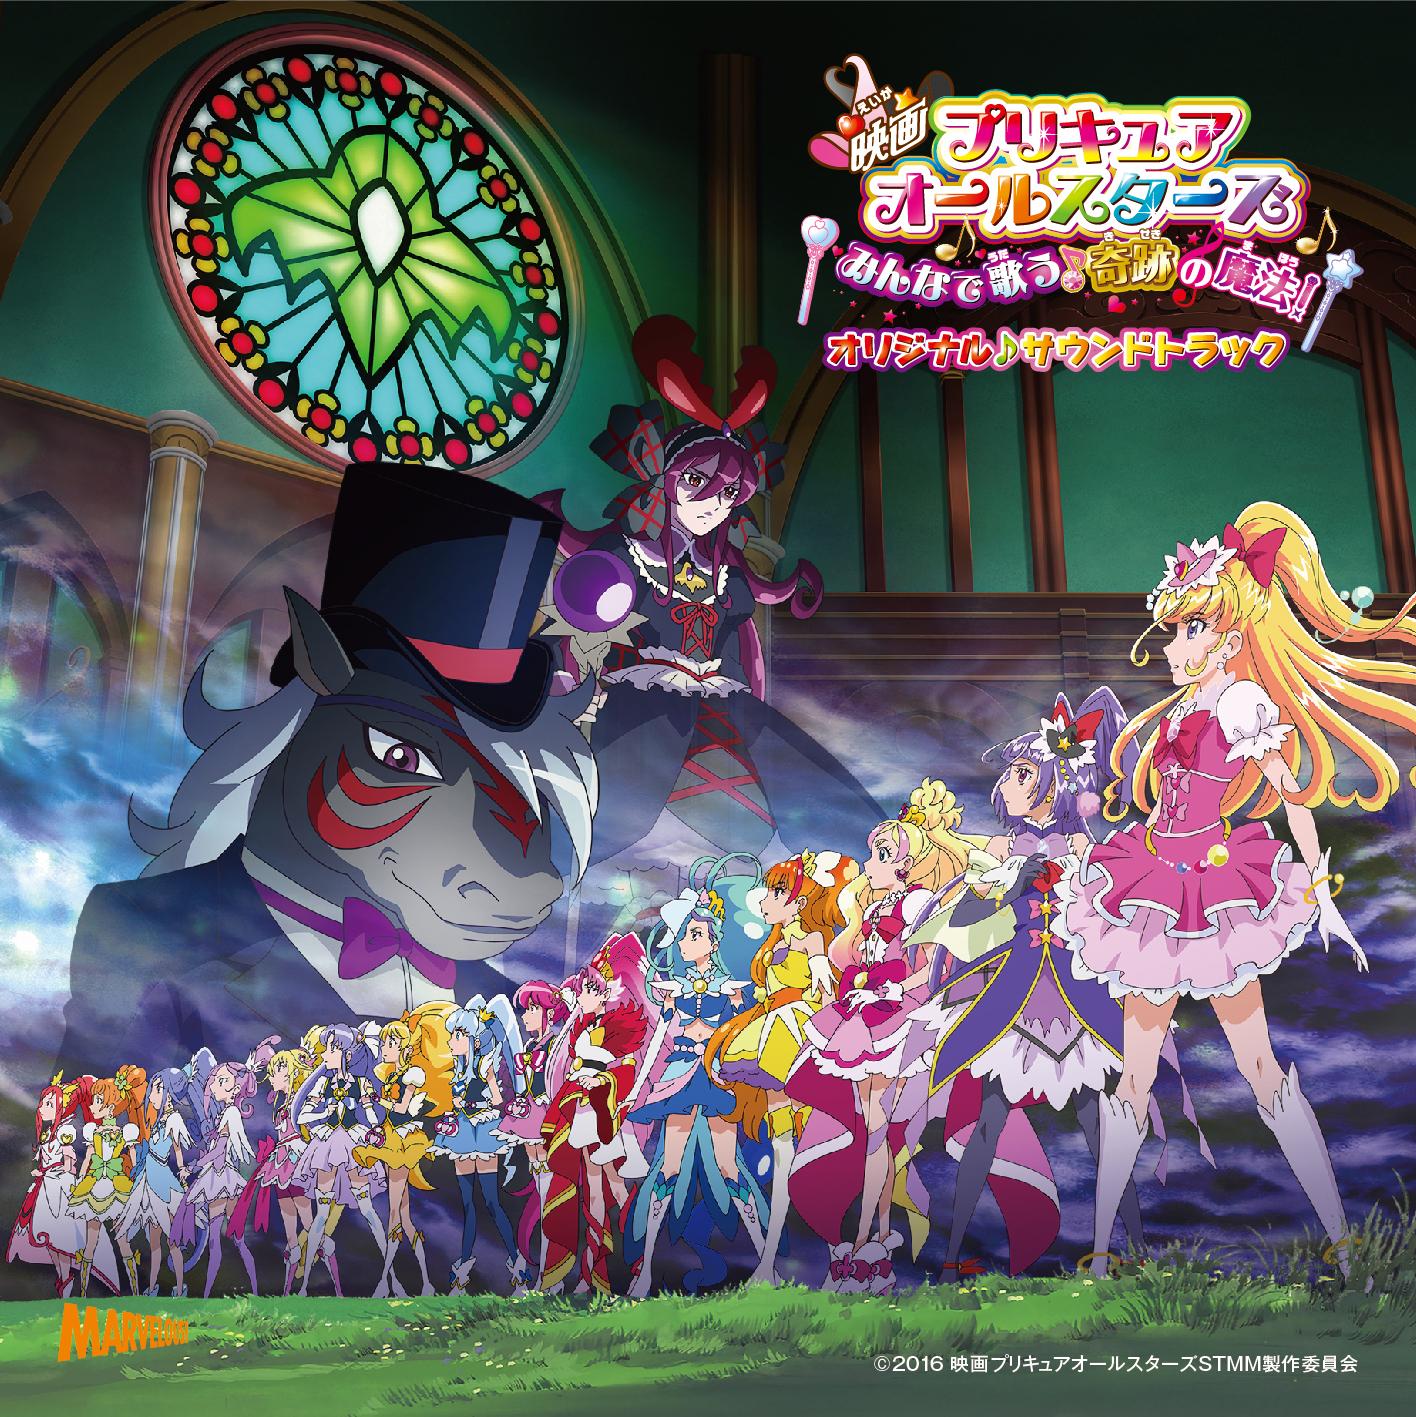 Pretty Cure All Stars Min'na de Utau♪ Kiseki no Mahou! Original♪ Soundtrack